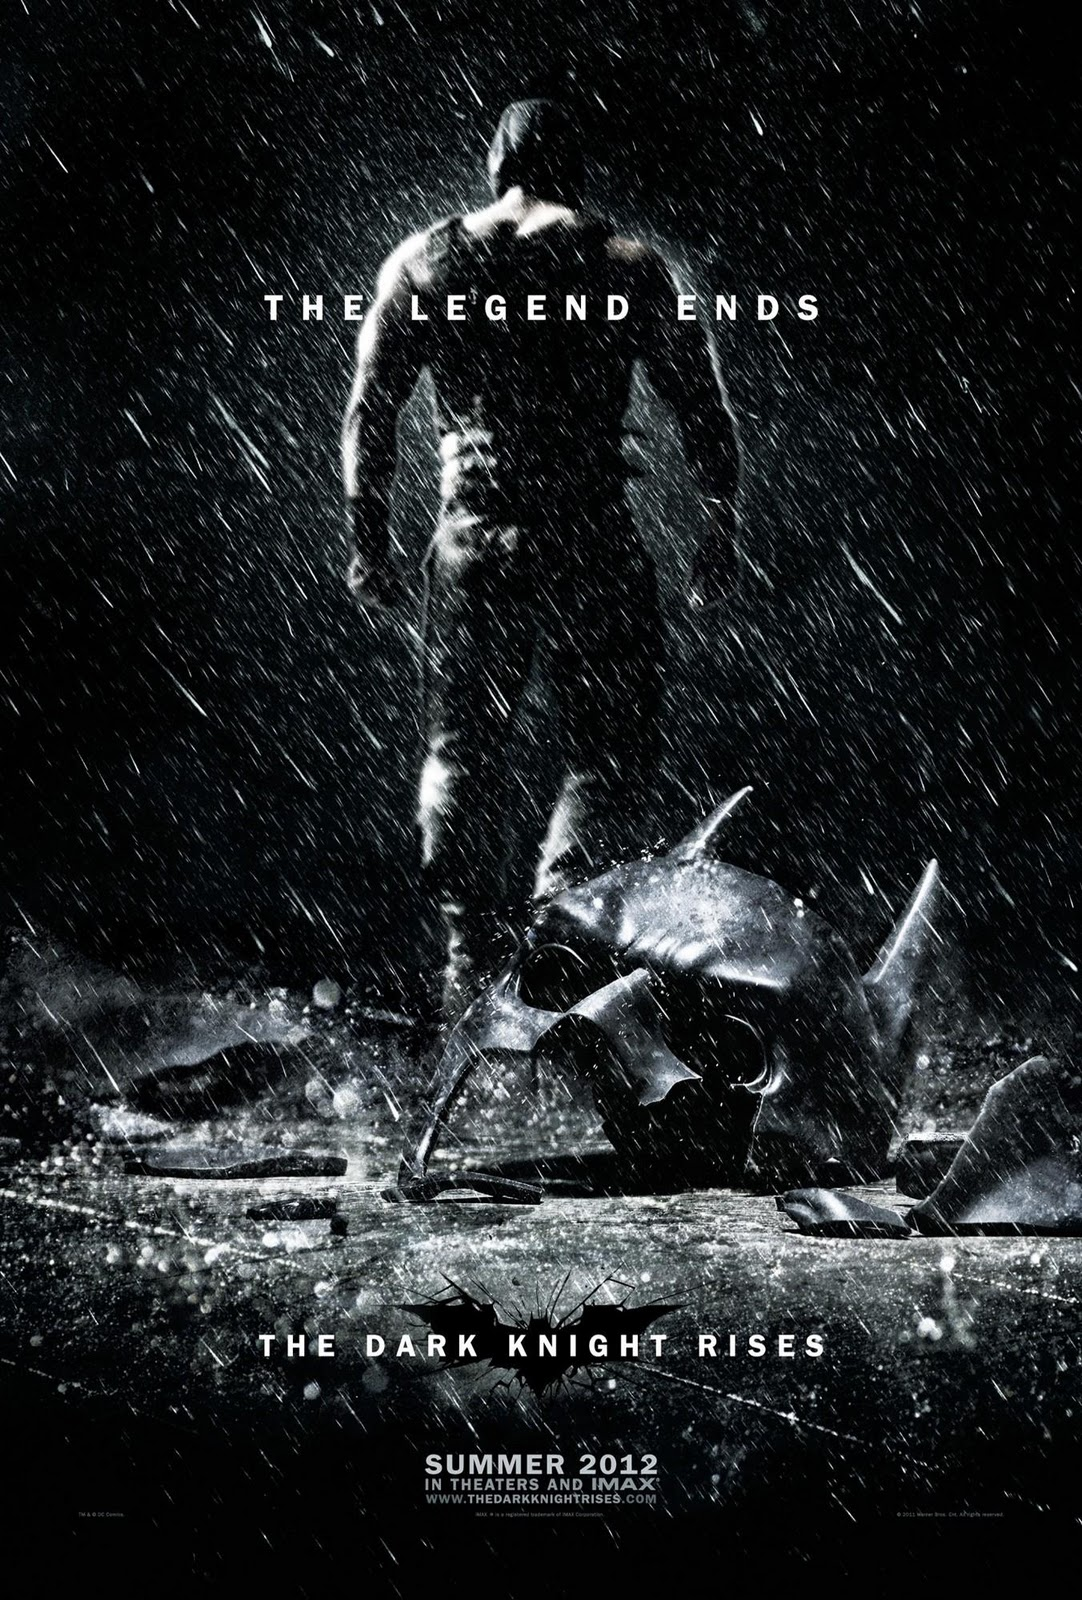 http://3.bp.blogspot.com/-i7BKFlB0FnA/TxN2JhJ249I/AAAAAAAARLM/bnF9026FRuw/s1600/the-dark-knight-rises-poster.jpg